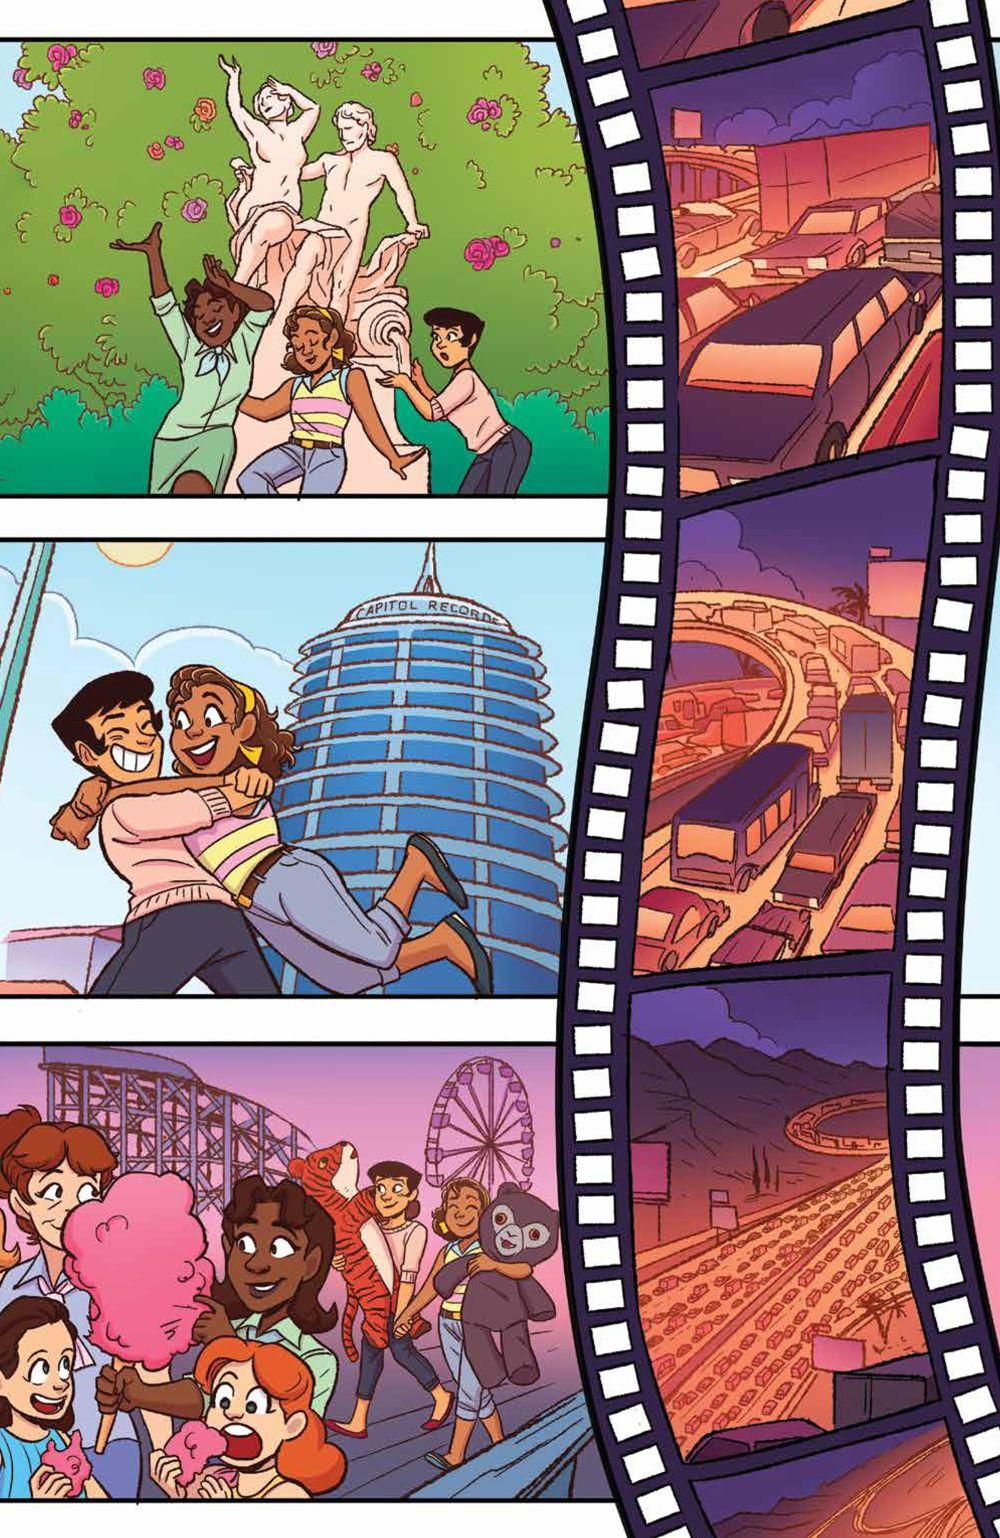 GoldieVance_OGN_LaLaLarceny_SC_PRESS_15 ComicList Previews: GOLDIE VANCE VOLUME 5 LARCENY IN LA LA LAND TP